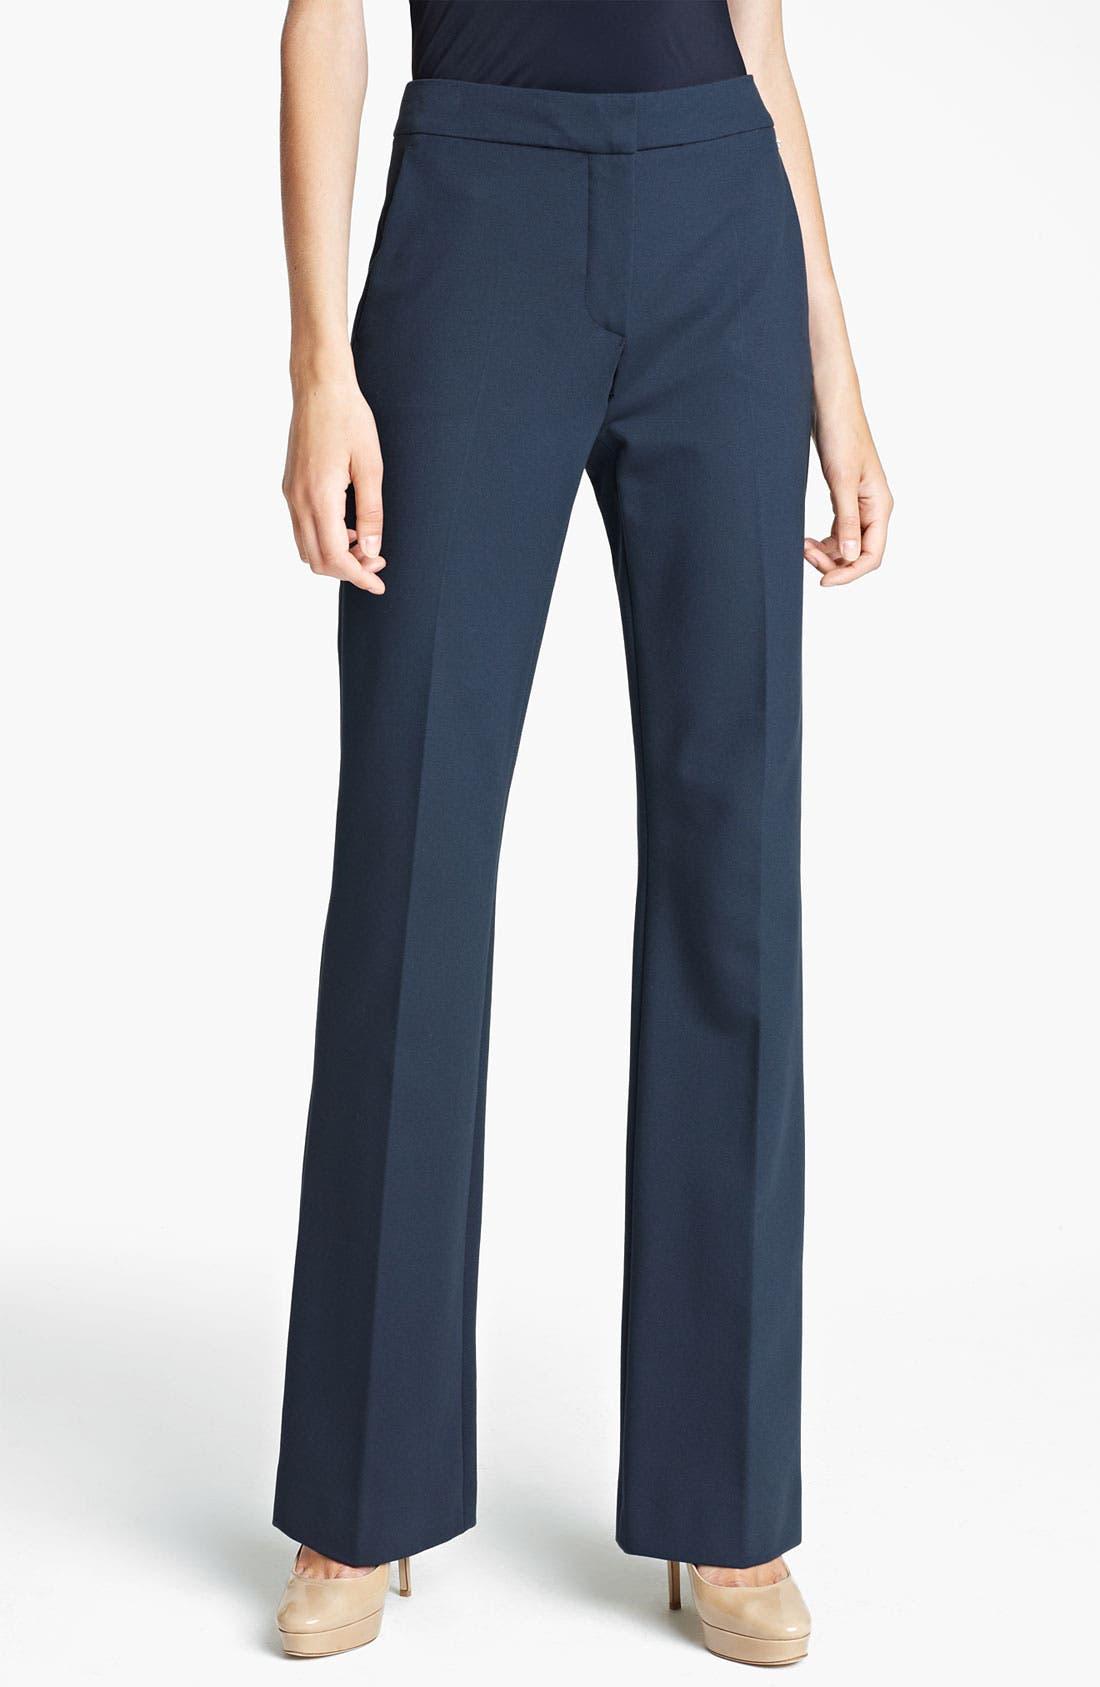 Alternate Image 1 Selected - Max Mara 'Agus' Jersey Pants